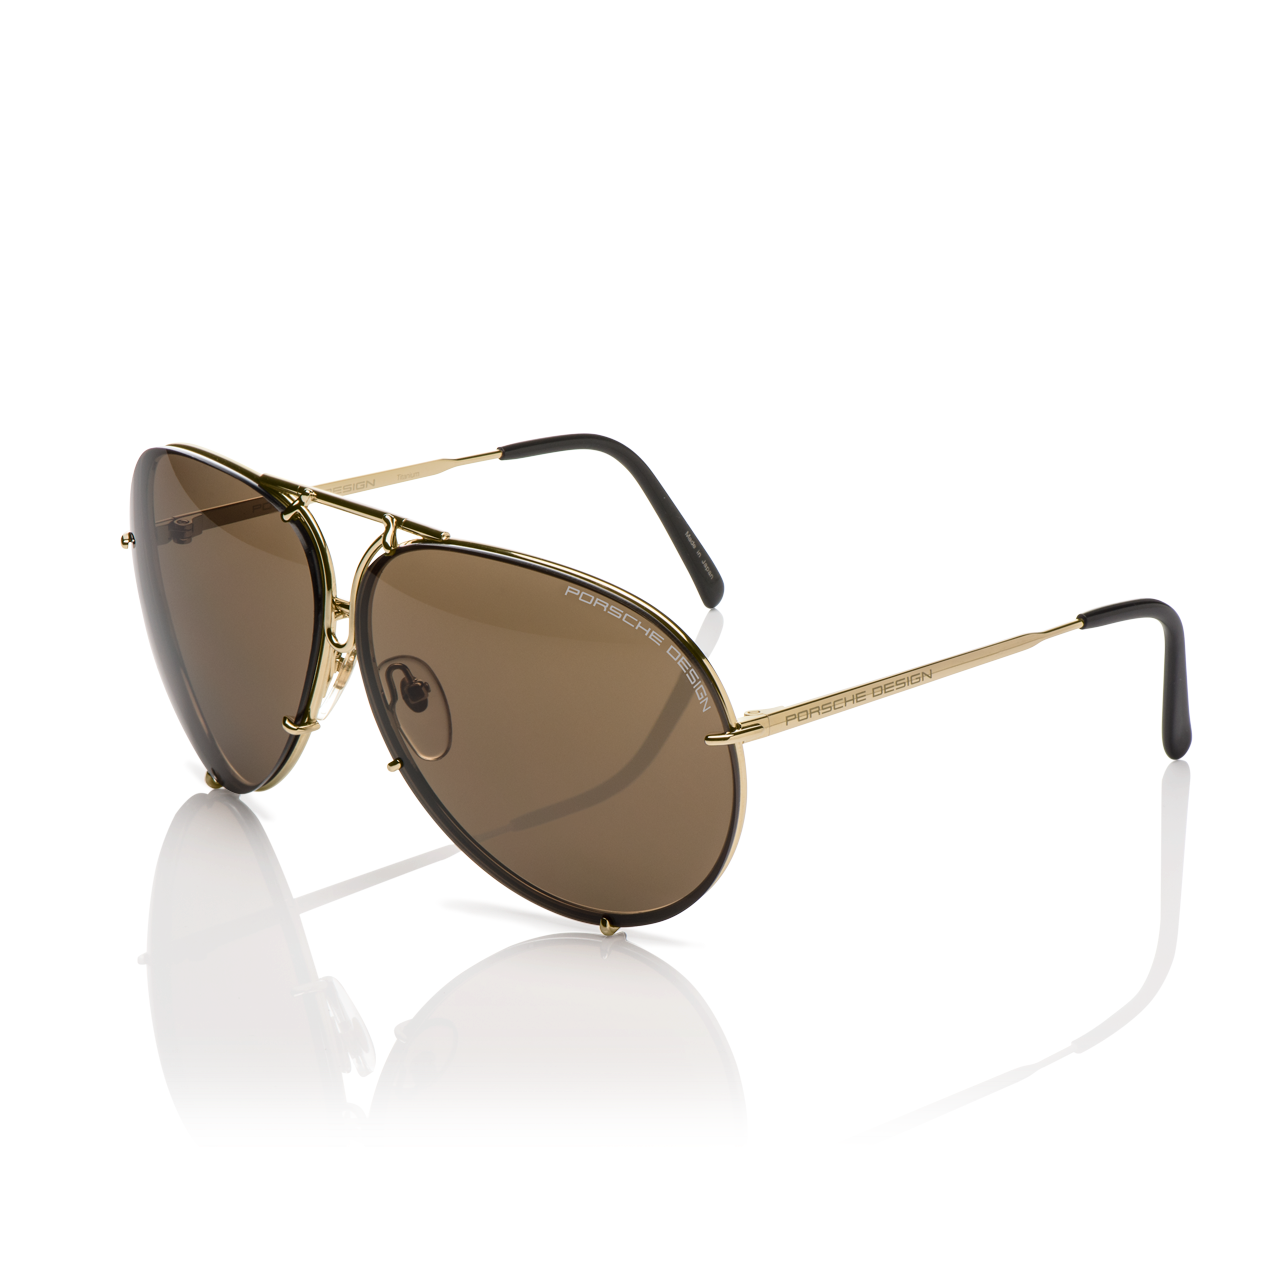 replica porsche design sunglasses p8478 8478 david simchi levi. Black Bedroom Furniture Sets. Home Design Ideas